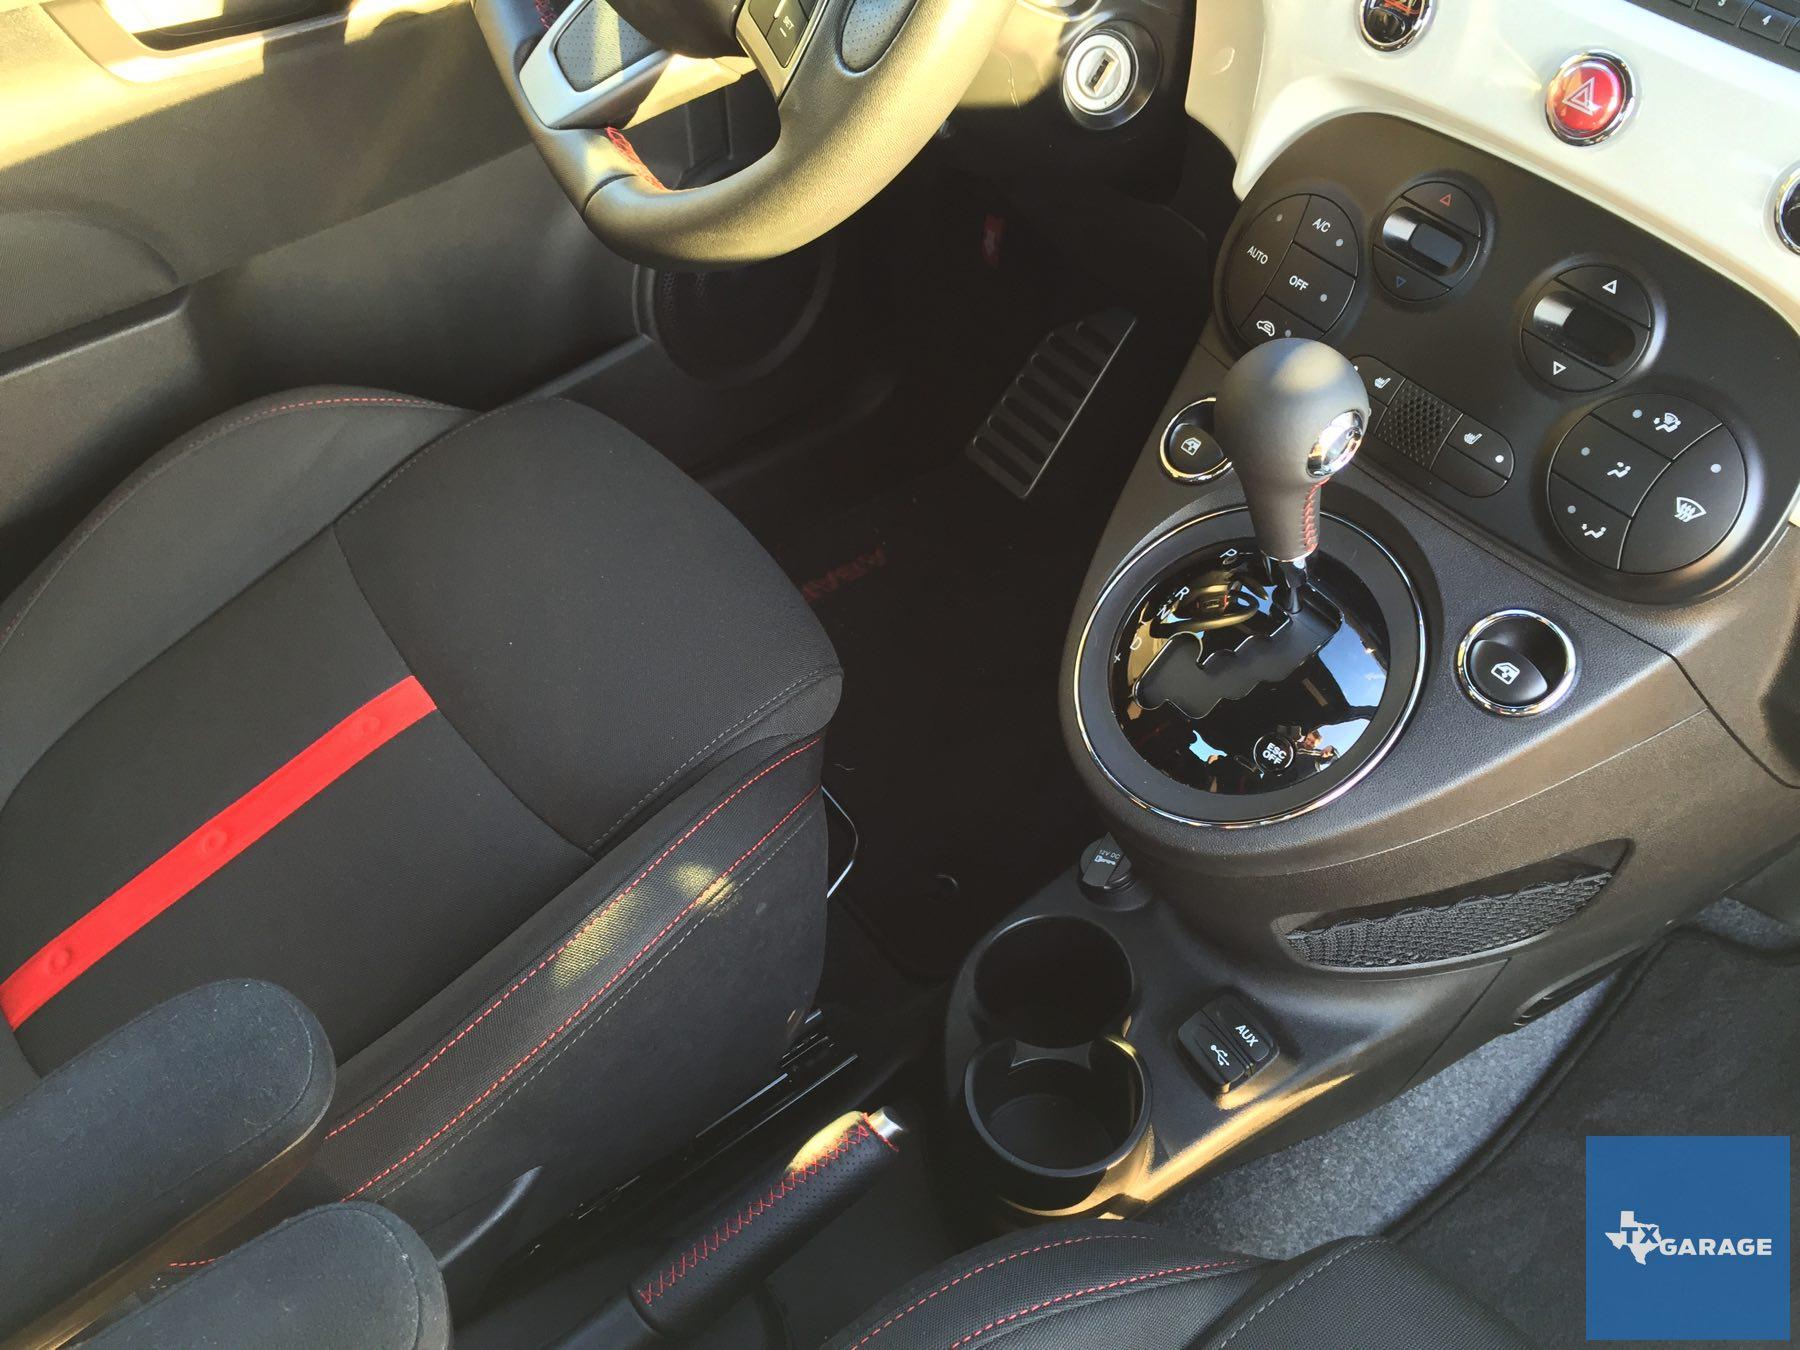 2015-Fiat-500-Abarth-txGarage-046